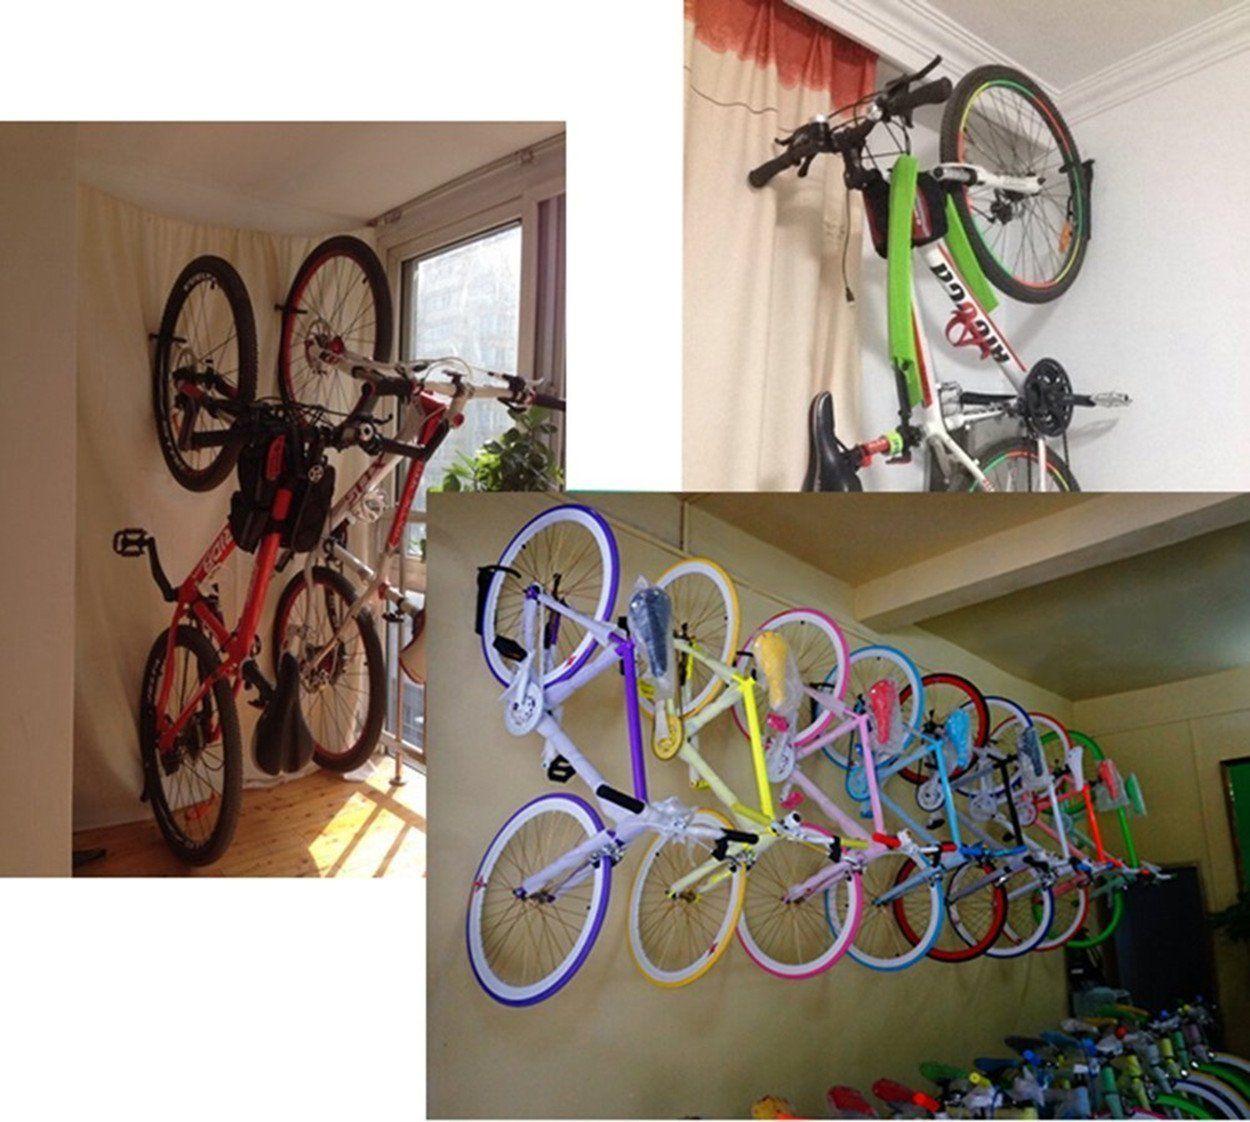 Bike Rack Hanger Wall Mount Bicycle Storage sack Single Hook For Garage Shed